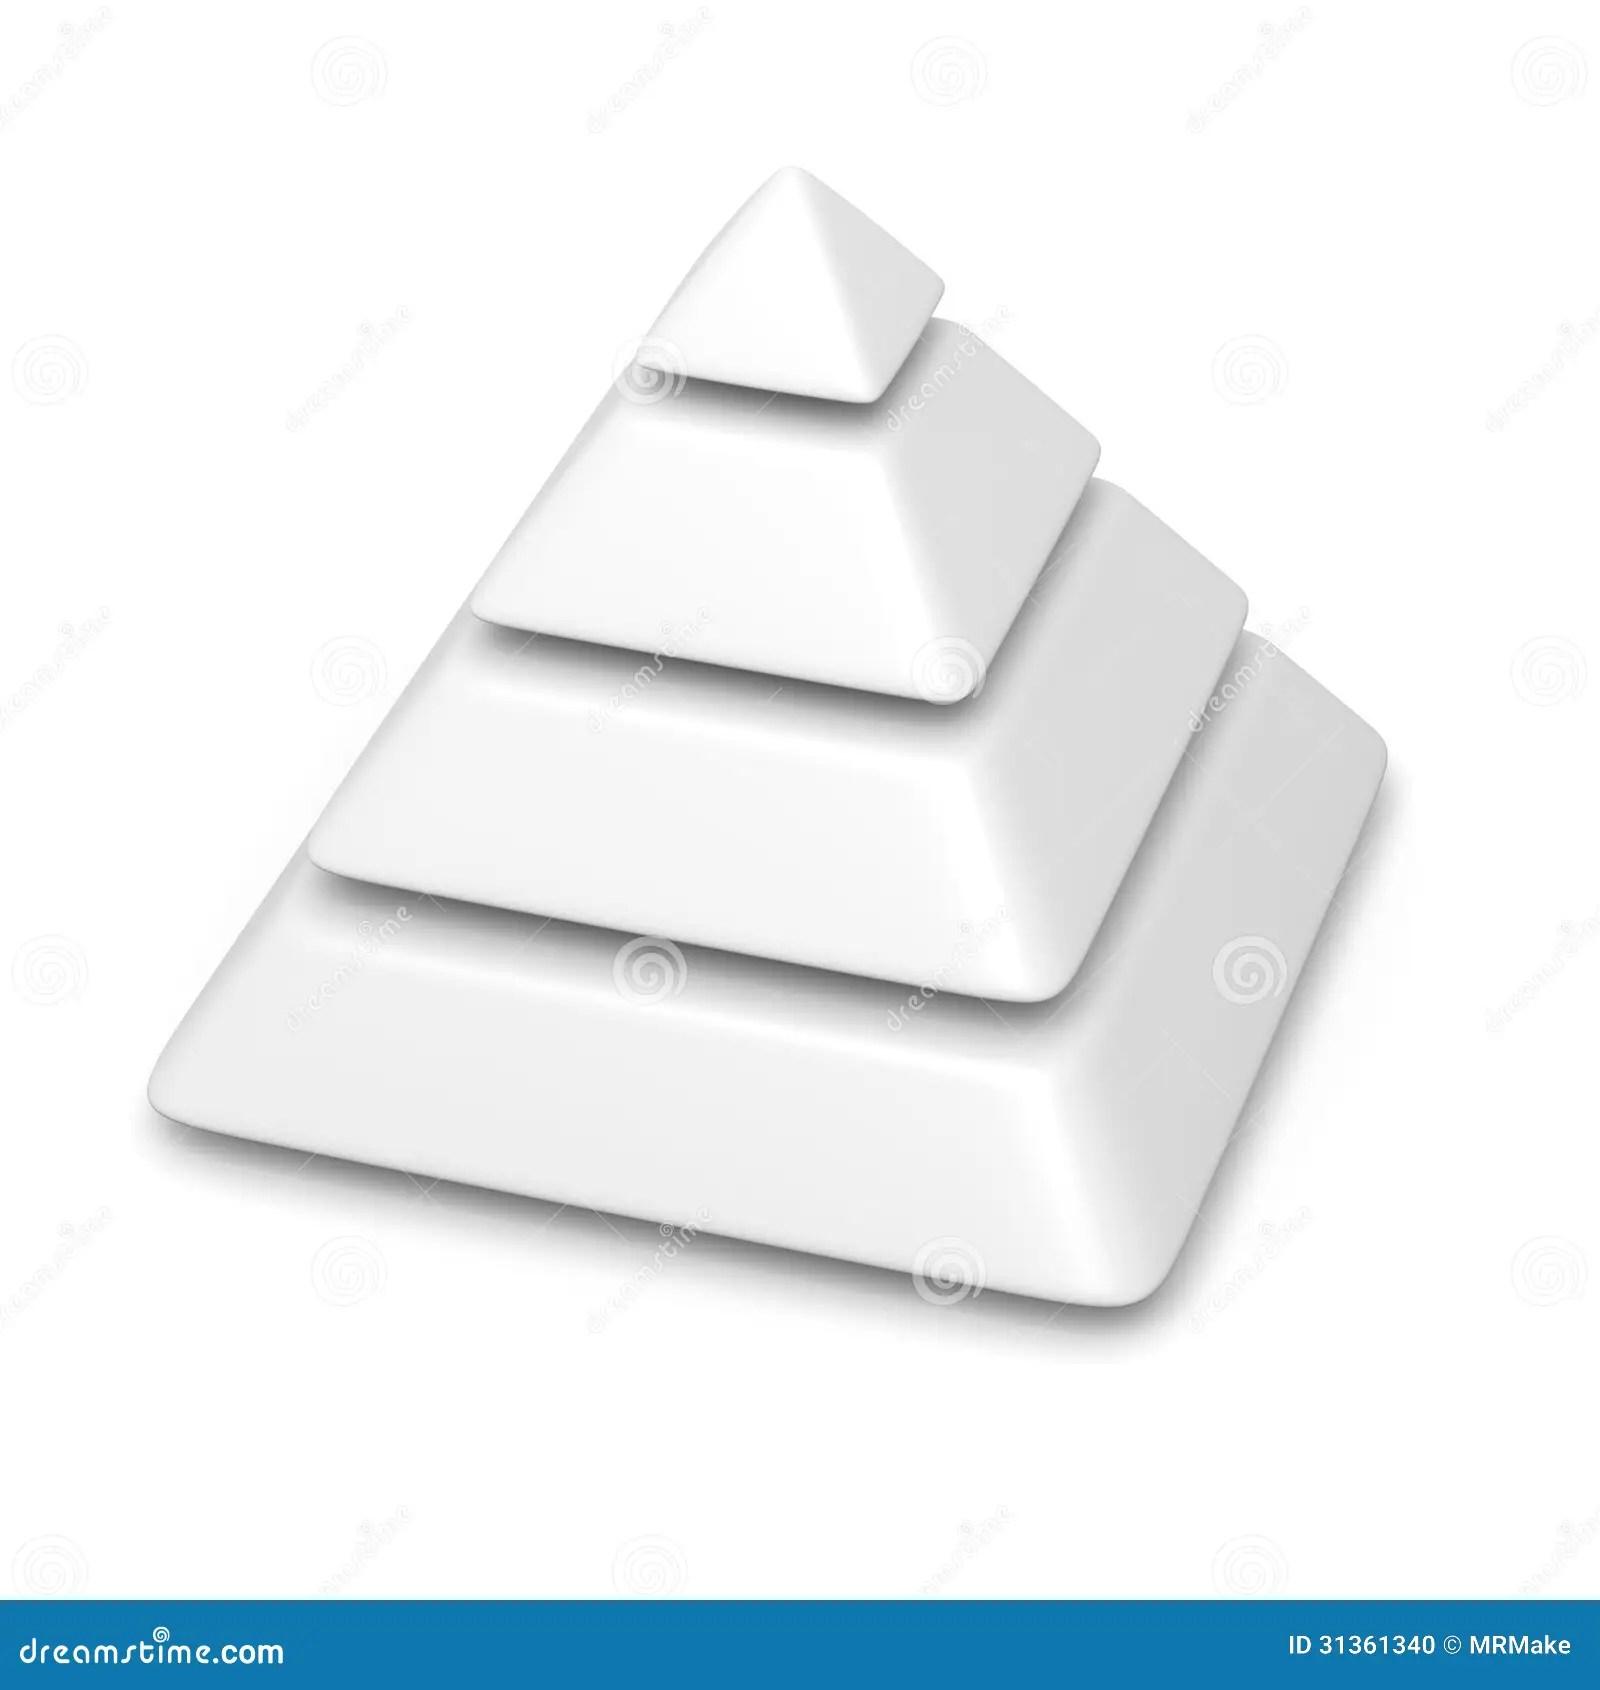 blank pyramid diagram 5 240 volt single phase motor wiring 4 levels stack stock illustration image